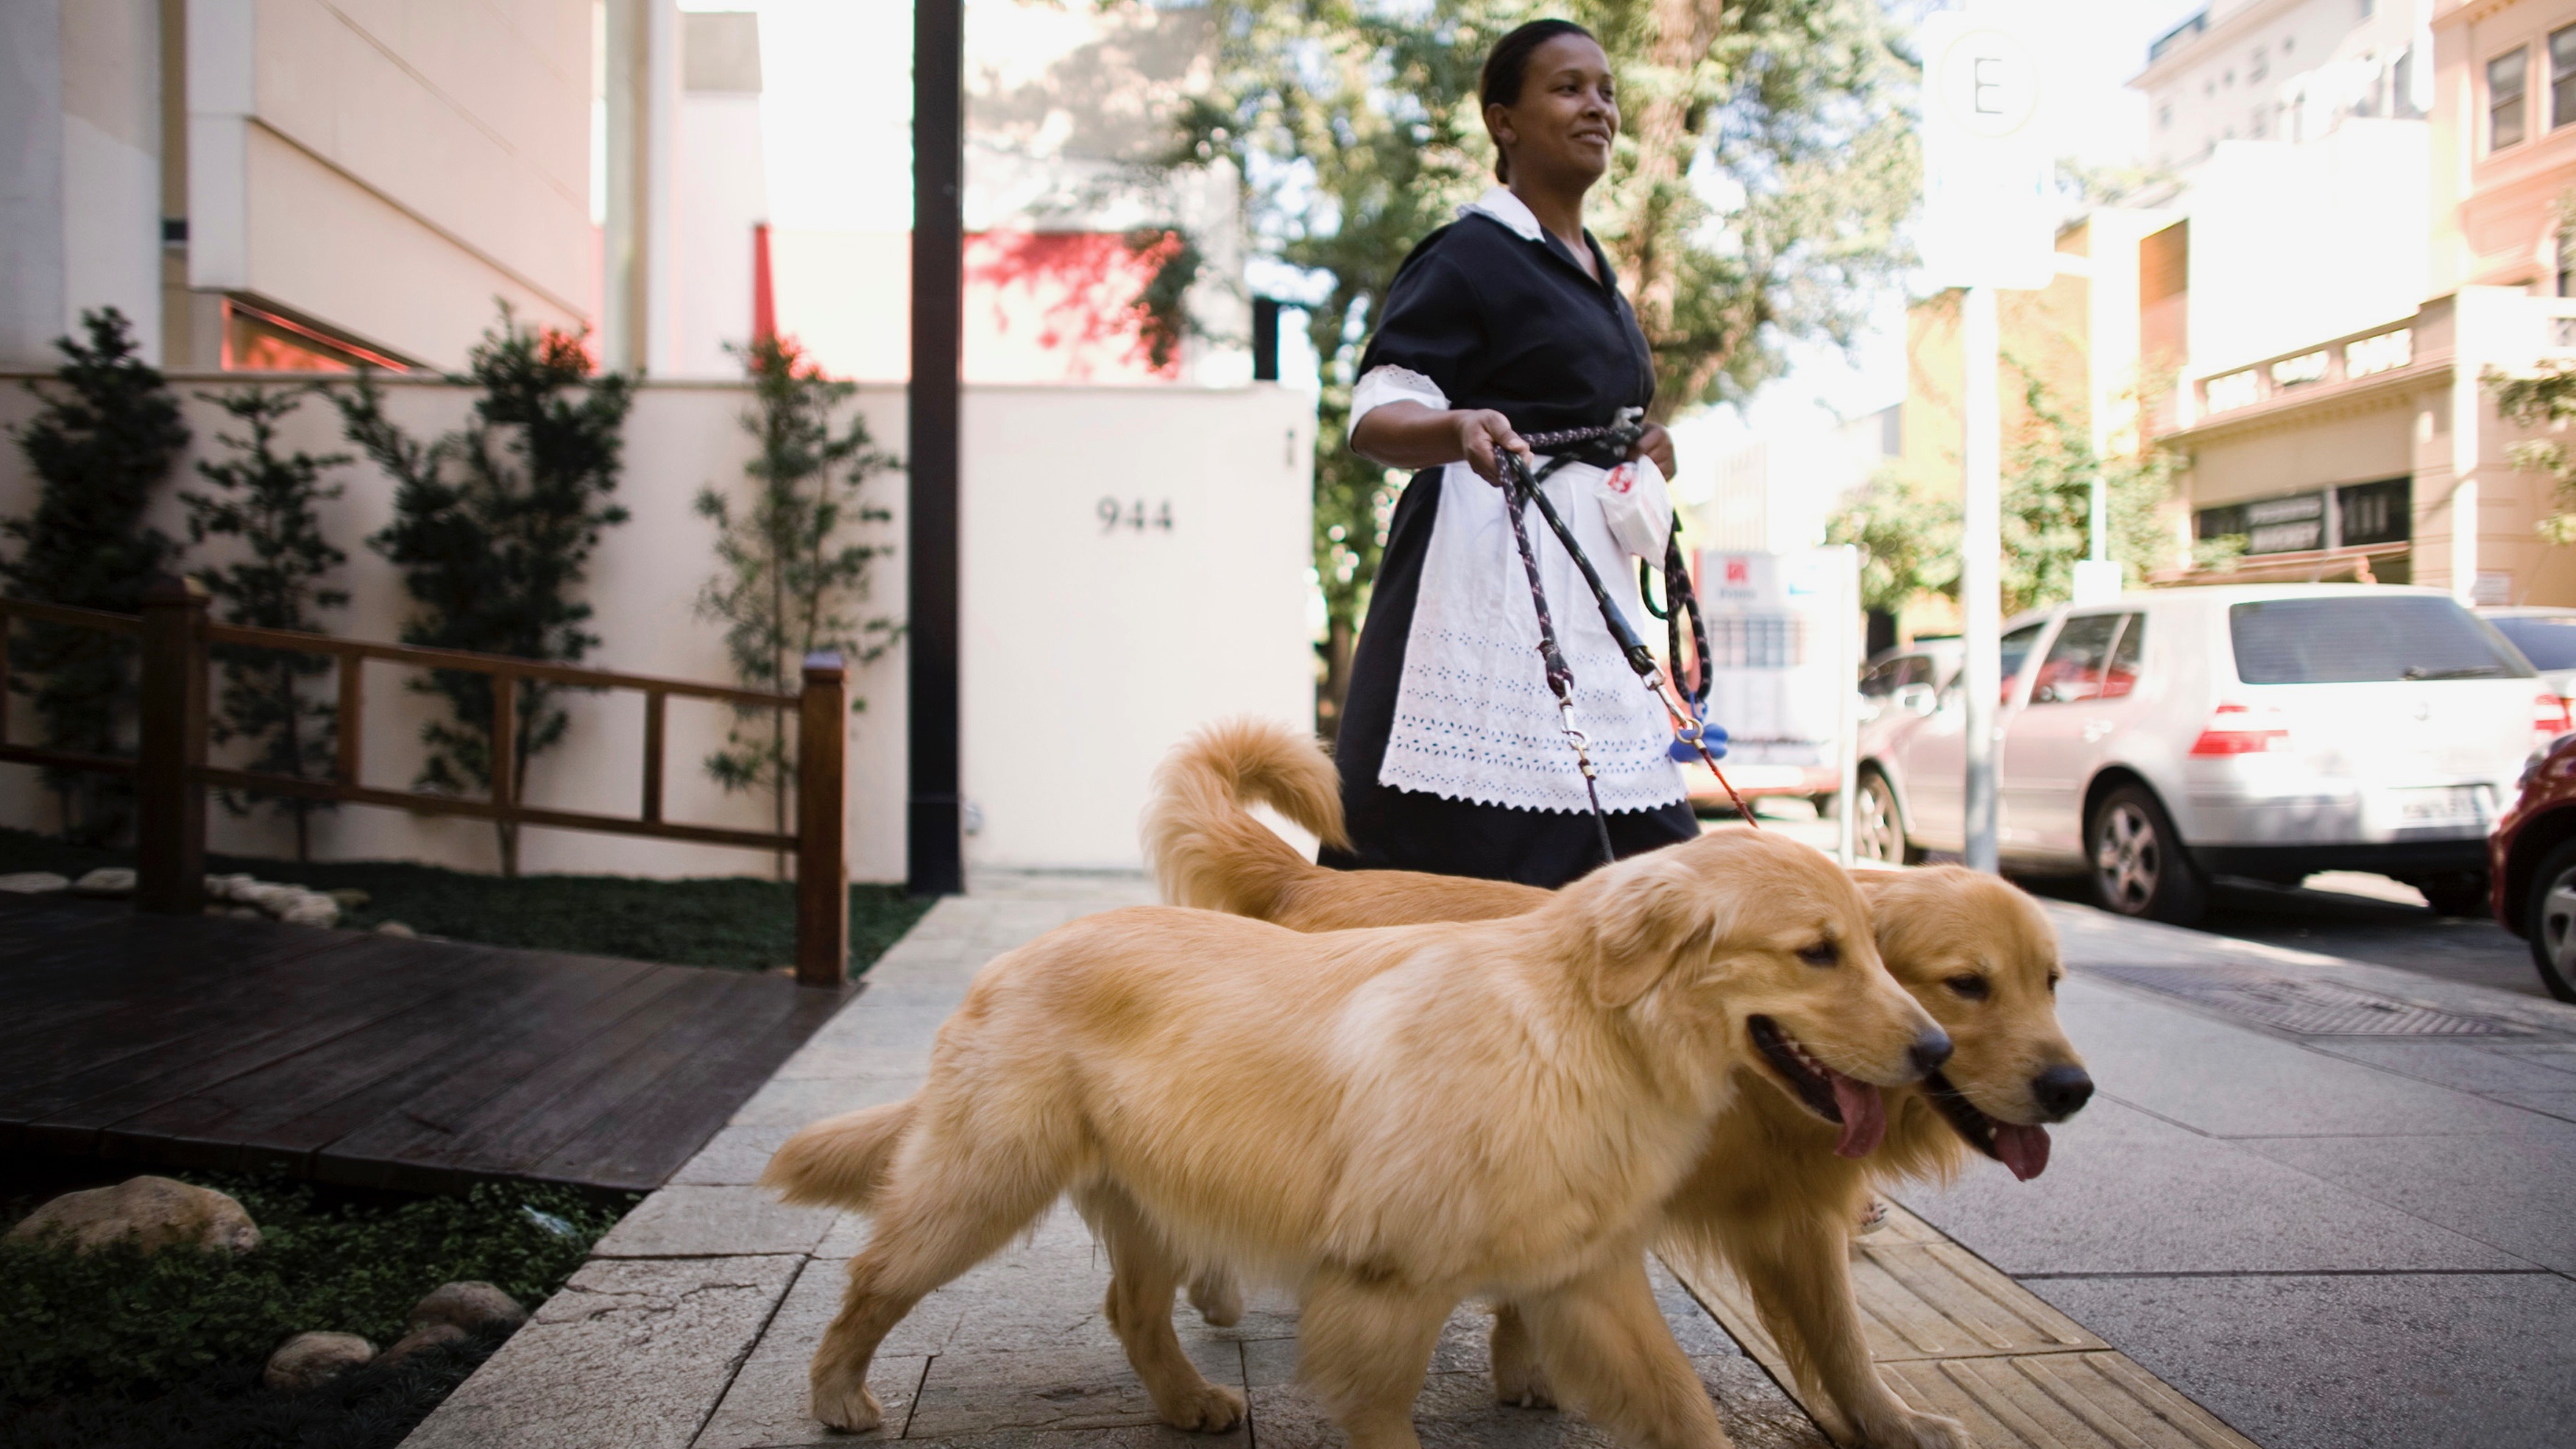 A maid in Sao Paulo, Brazil walks dogs along posh Oscar Freire street.